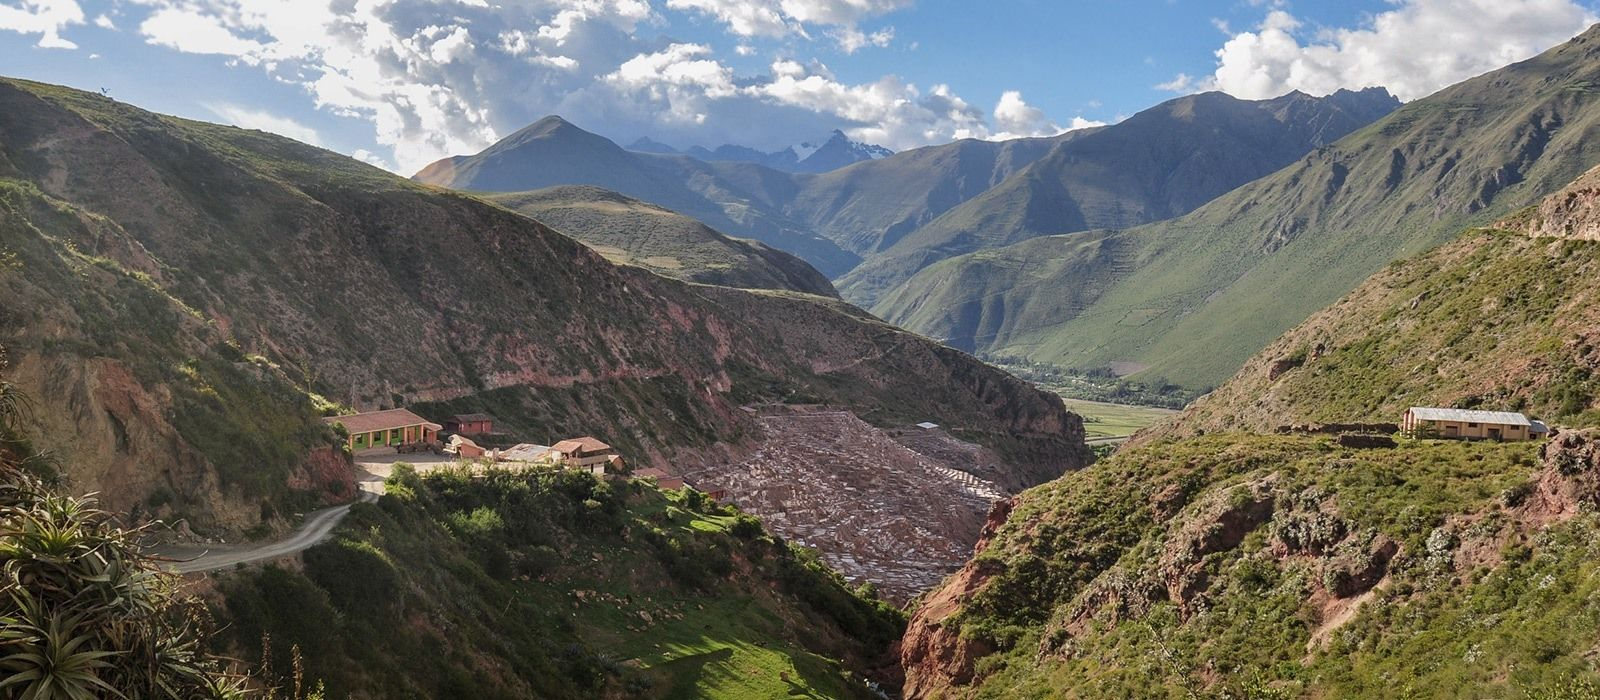 Peru: Machu Picchu and Beach Bliss Tour Trip 2